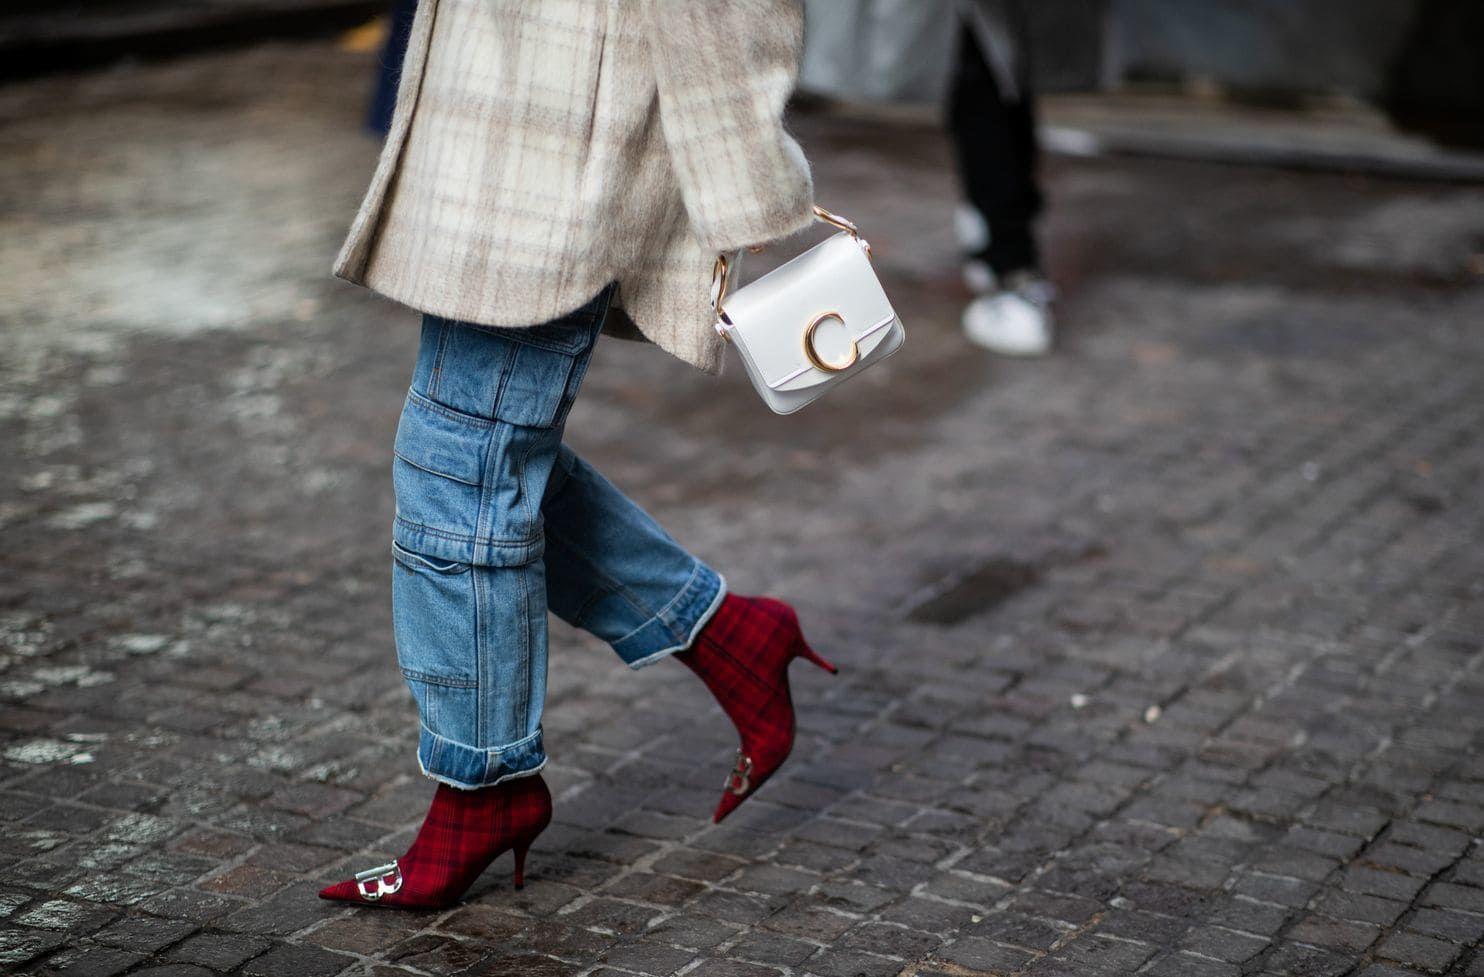 Kelebihan Celana Jeans Dibanding Celana Bahan Kain